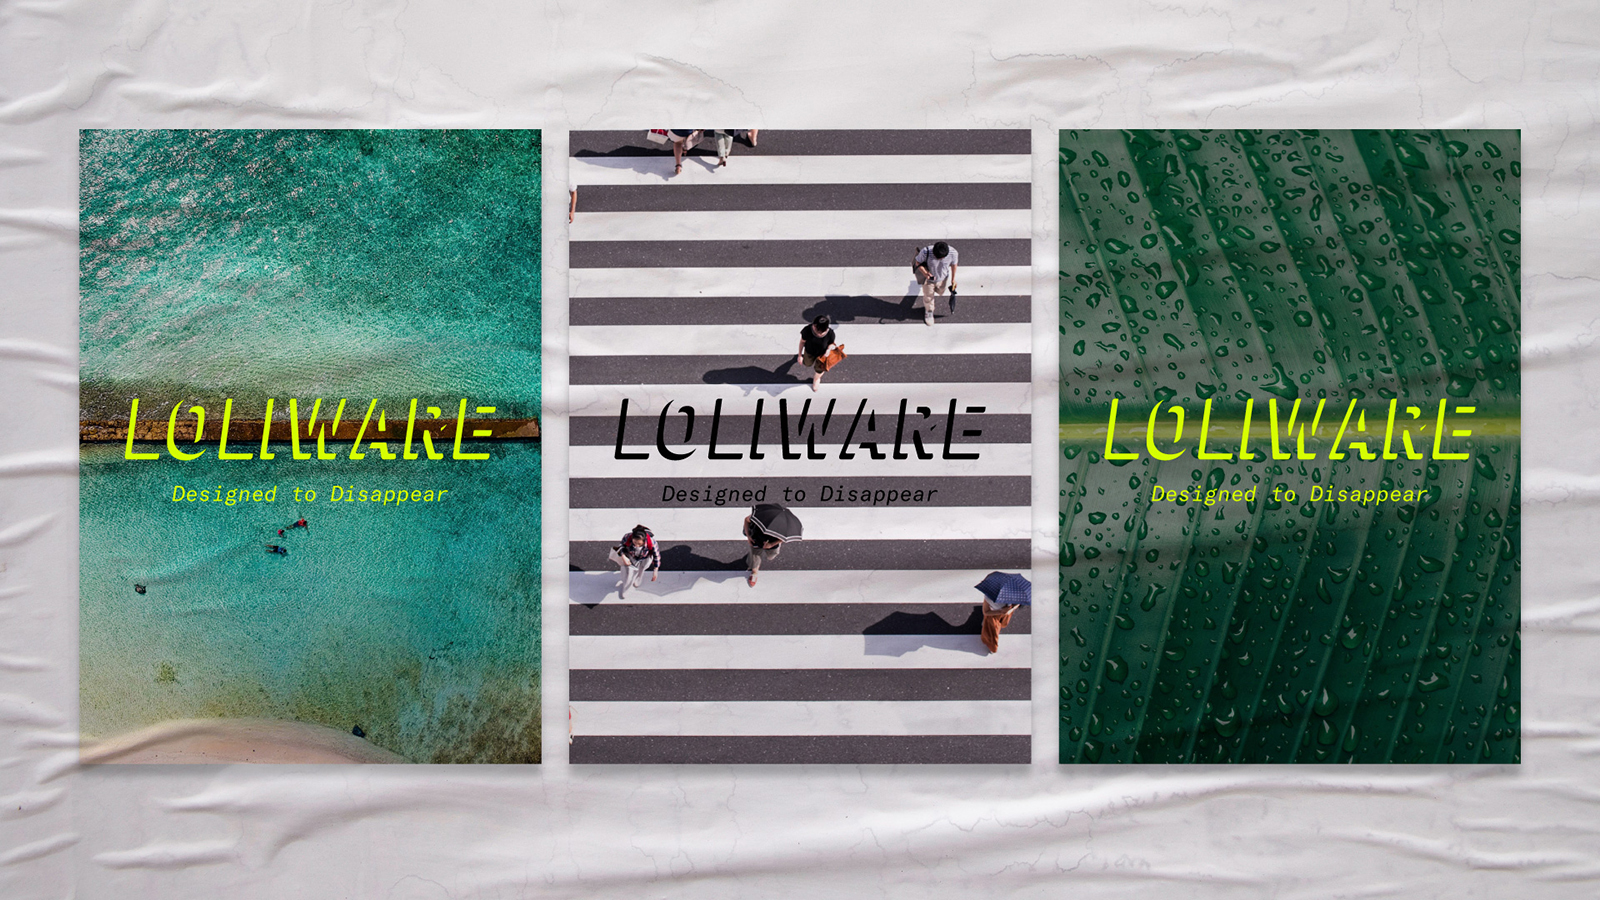 Loliware手机品牌启用全新的品牌VI形象设计-深圳VI设计8